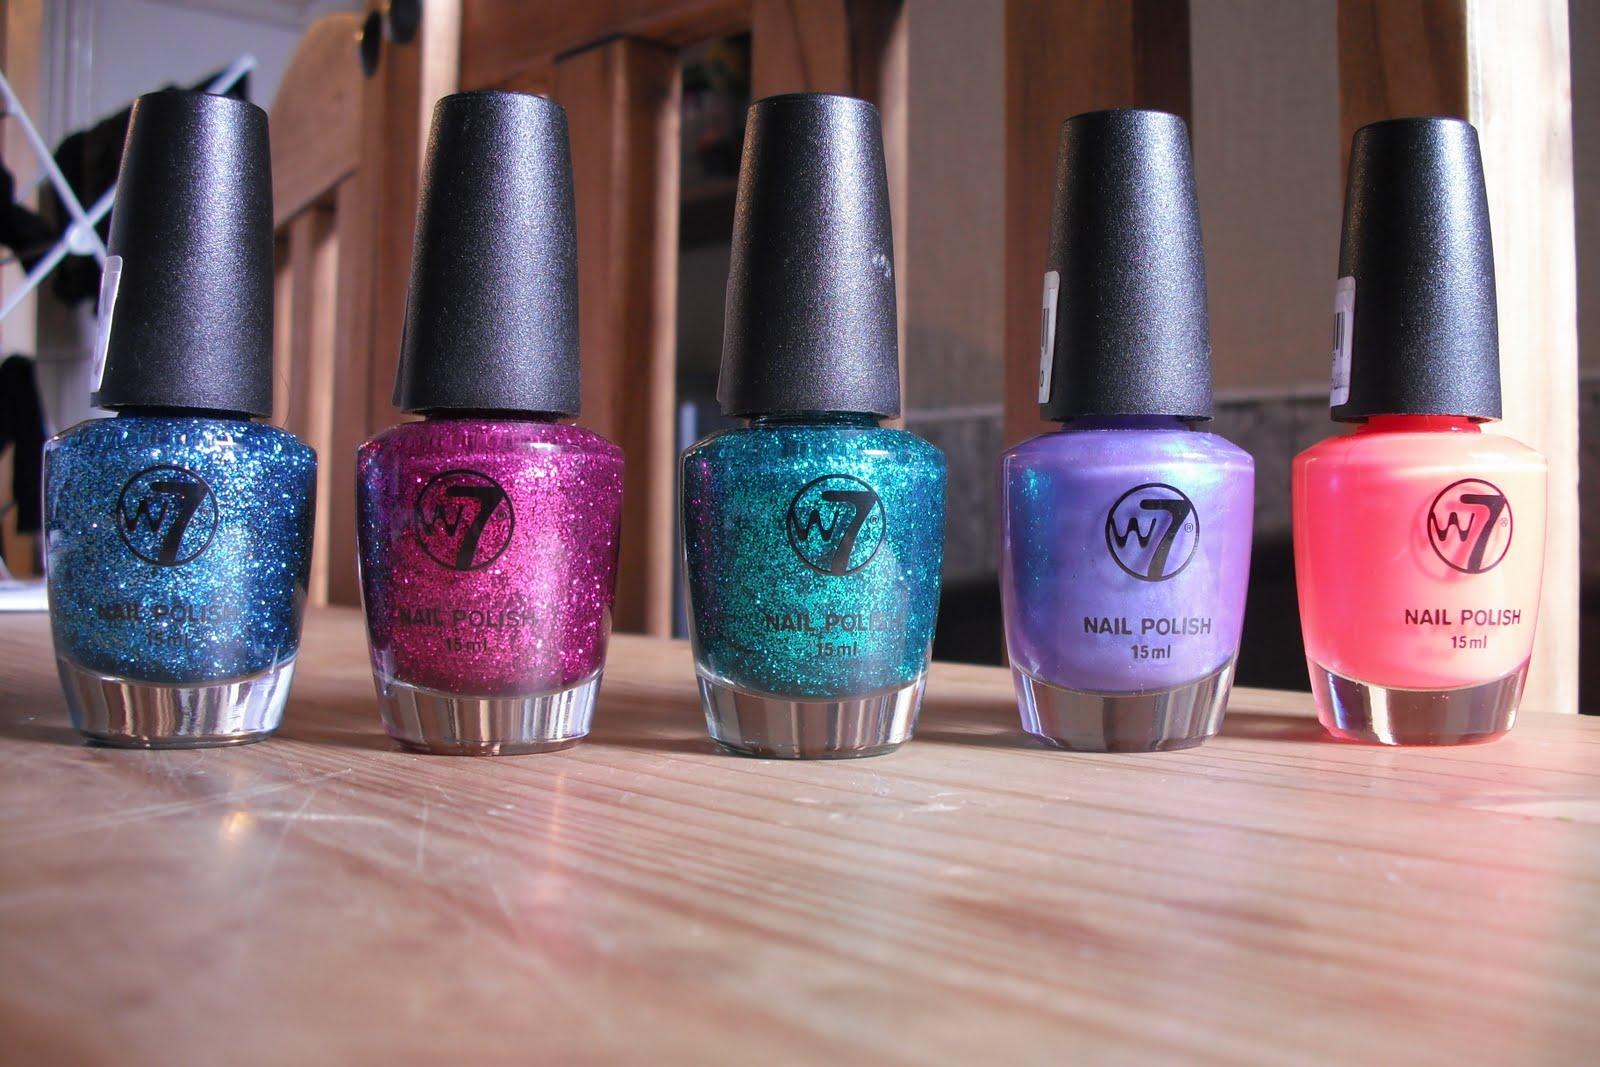 Beautifully Addicted To - a Beauty Blog.....: W7 Nail Polish